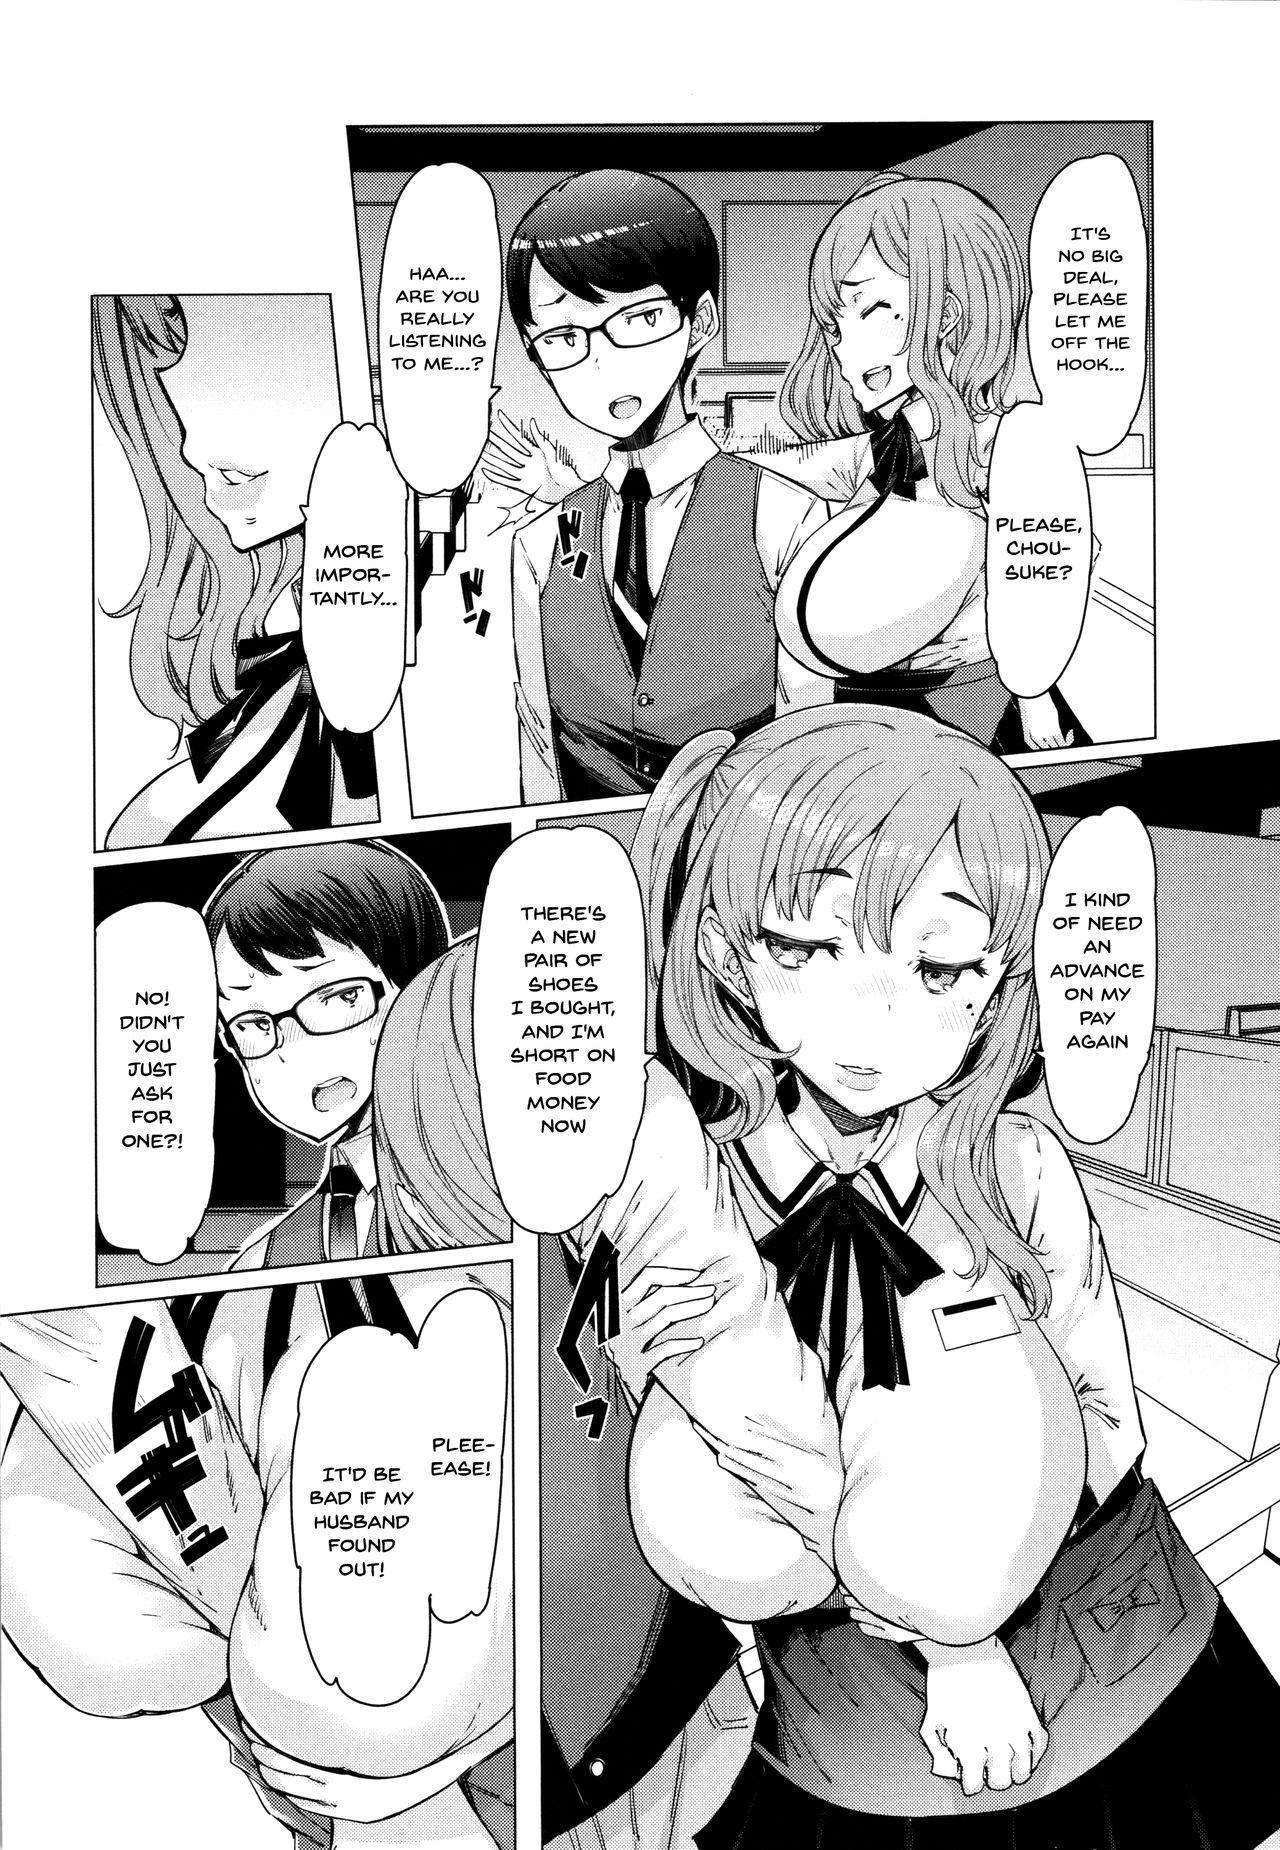 Hitozuma ga Ero Sugite Shigoto ni Naranai! | These Housewives Are Too Lewd I Can't Help It! 7